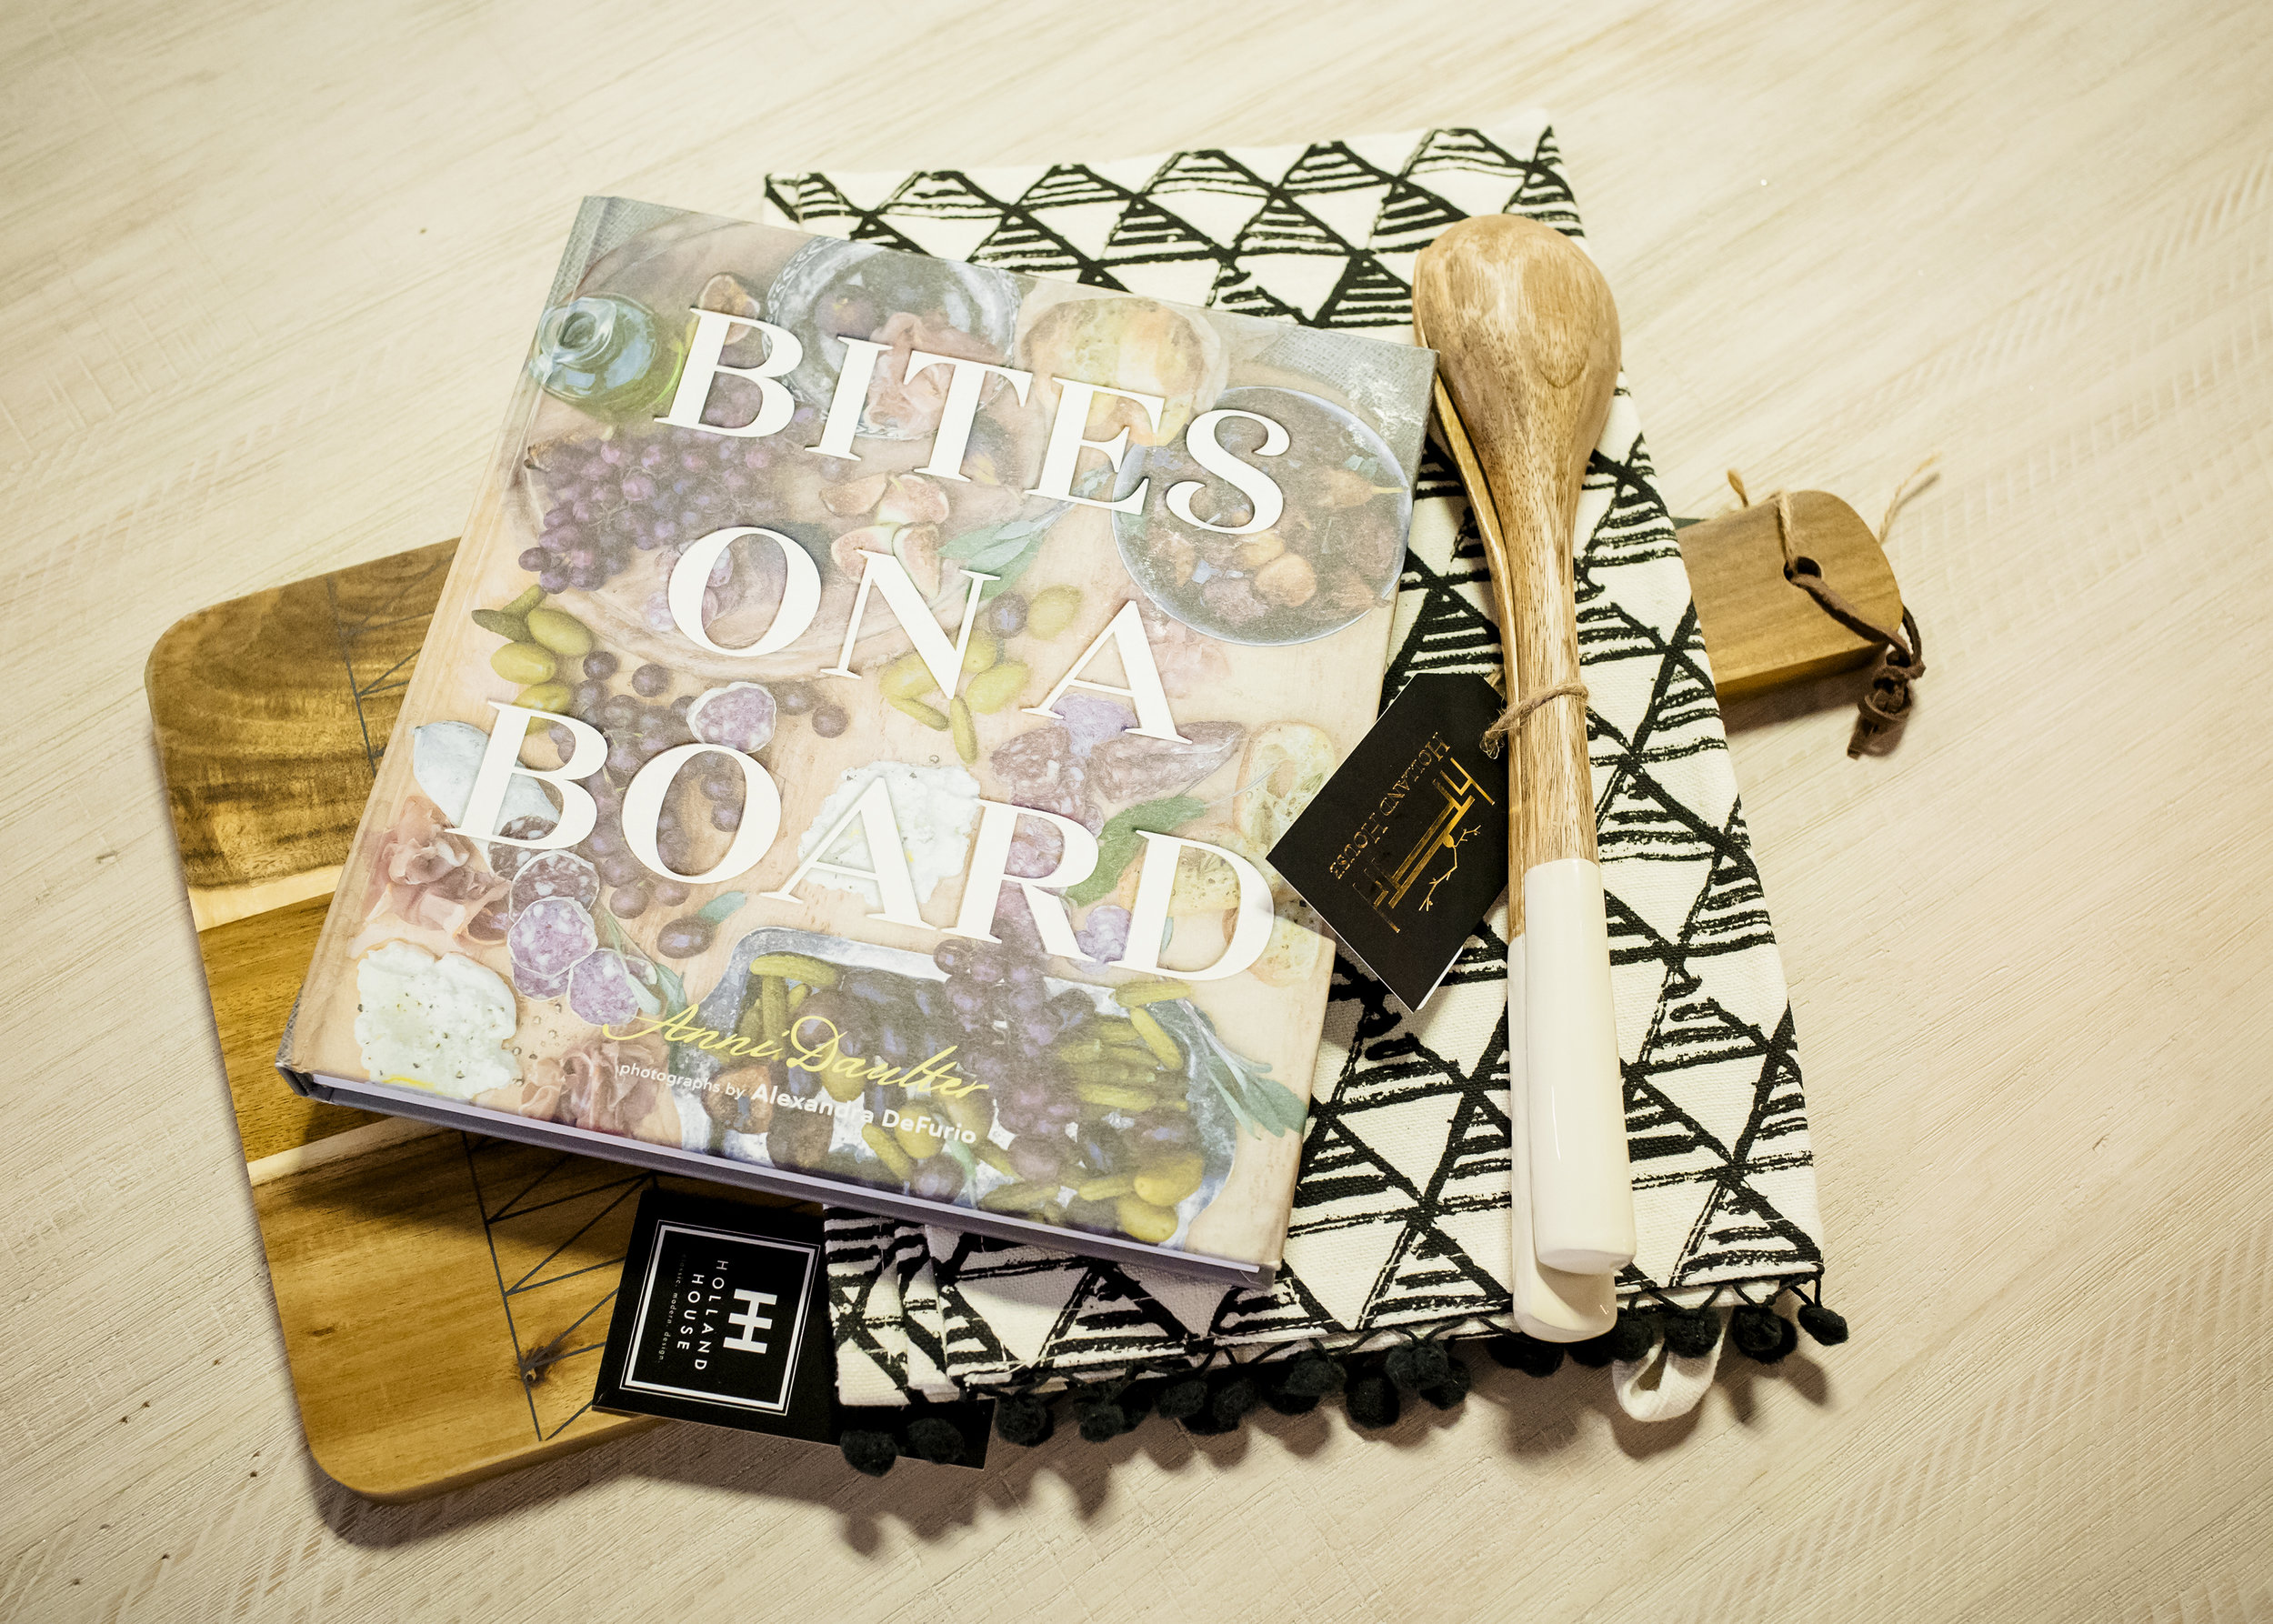 THE MAN - Cutting Board | $28Tea Towel | $11.50Salad Set | $16Bites on a Board | $25